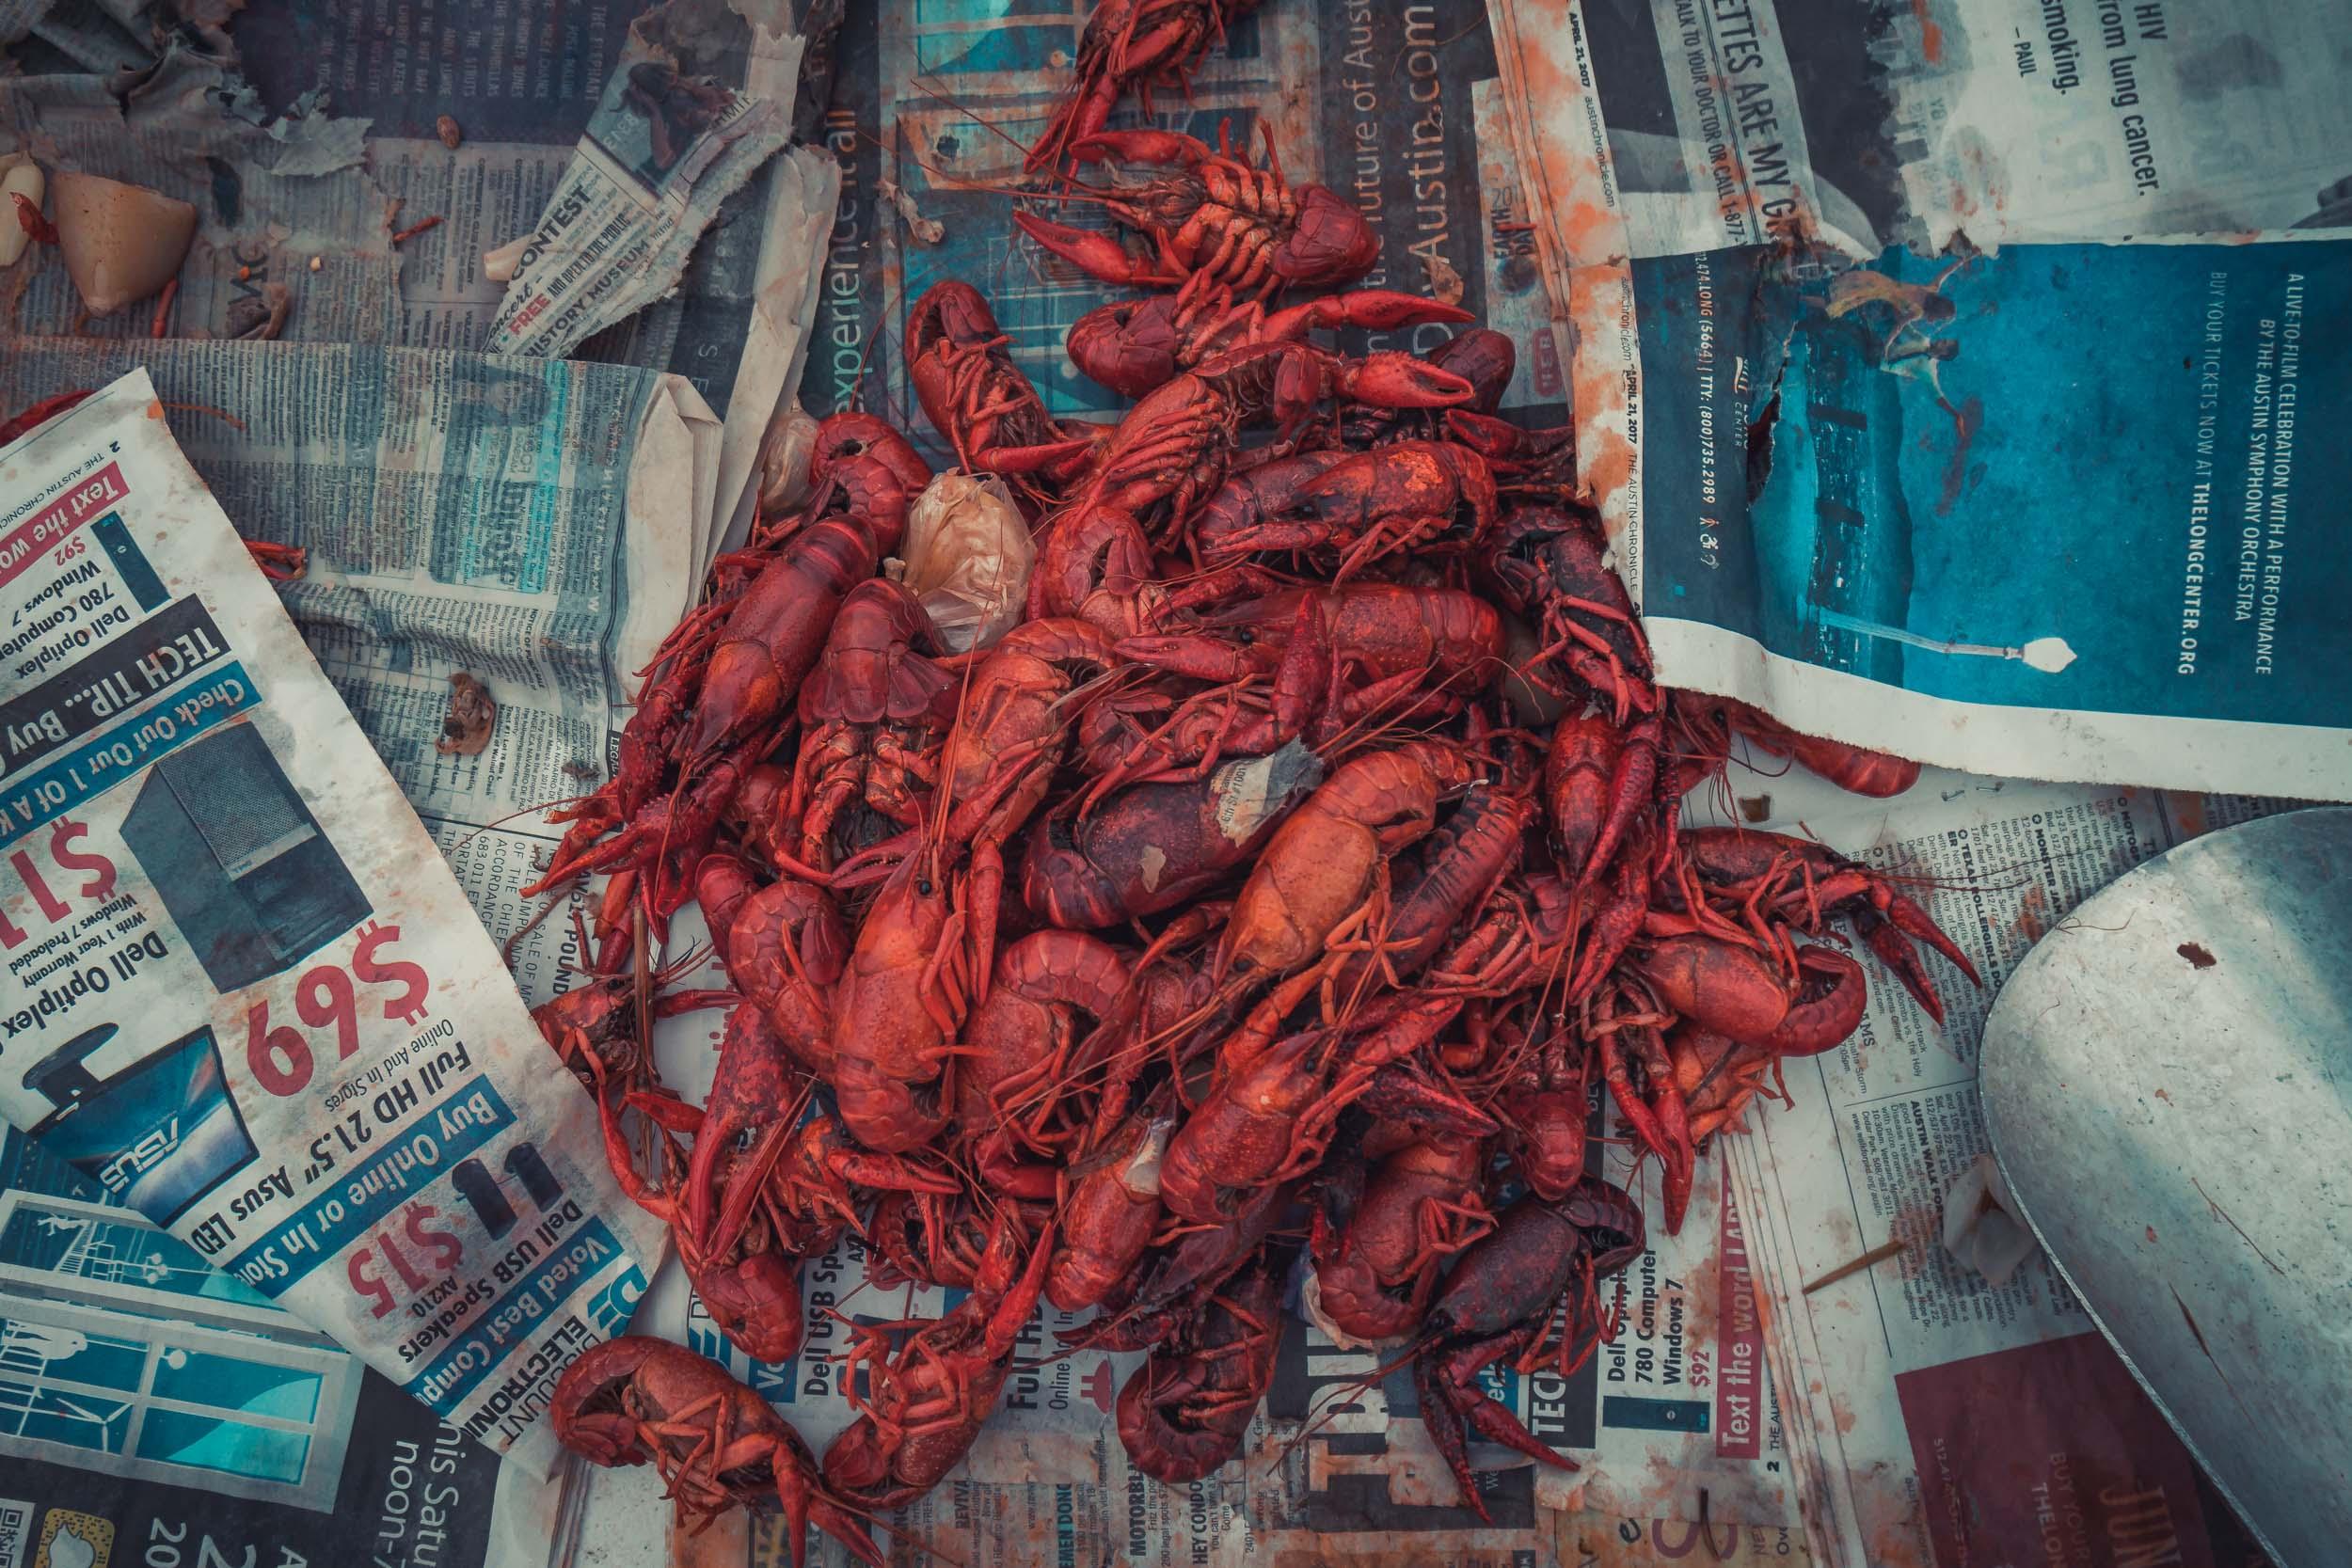 Buzz Mill, Austin TXMay 6th, 2017 - Crawfish boil